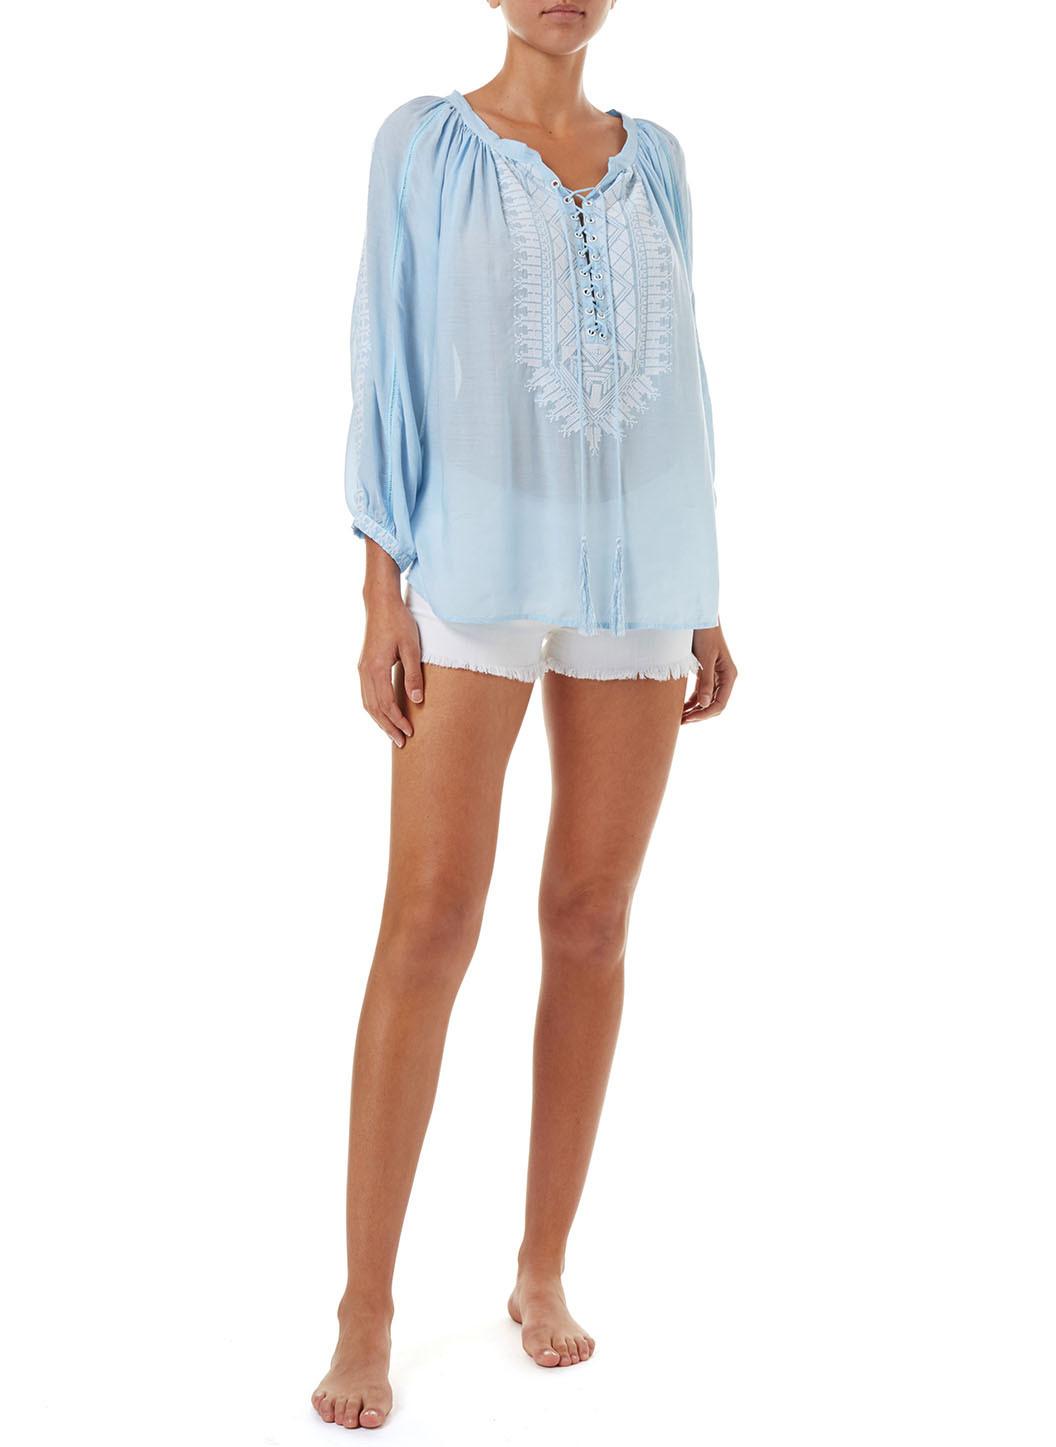 simona-maya-white-laceup-embroidered-blouse-2019-f